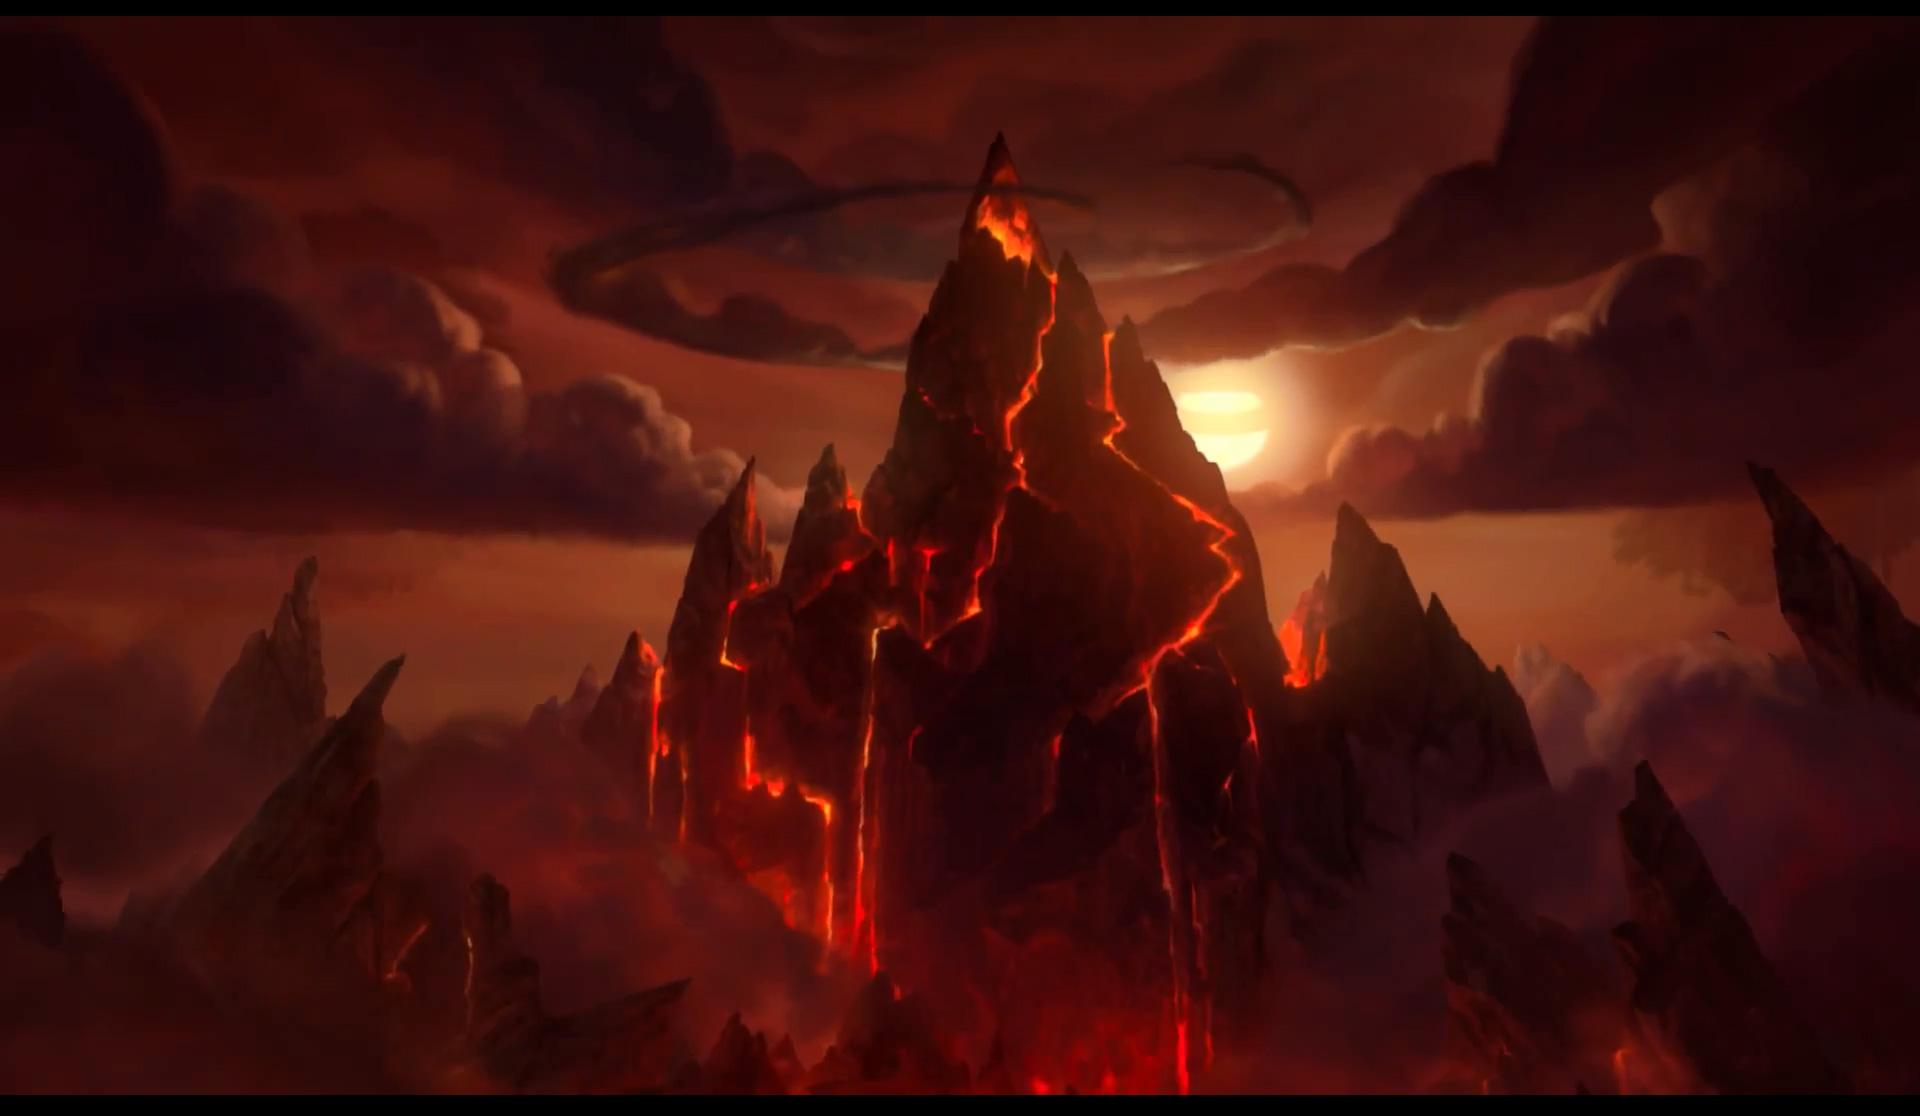 World Of Warcraft Wallpapers Hd Blackrock Mountain A Hearthstone Adventure Wallpapers